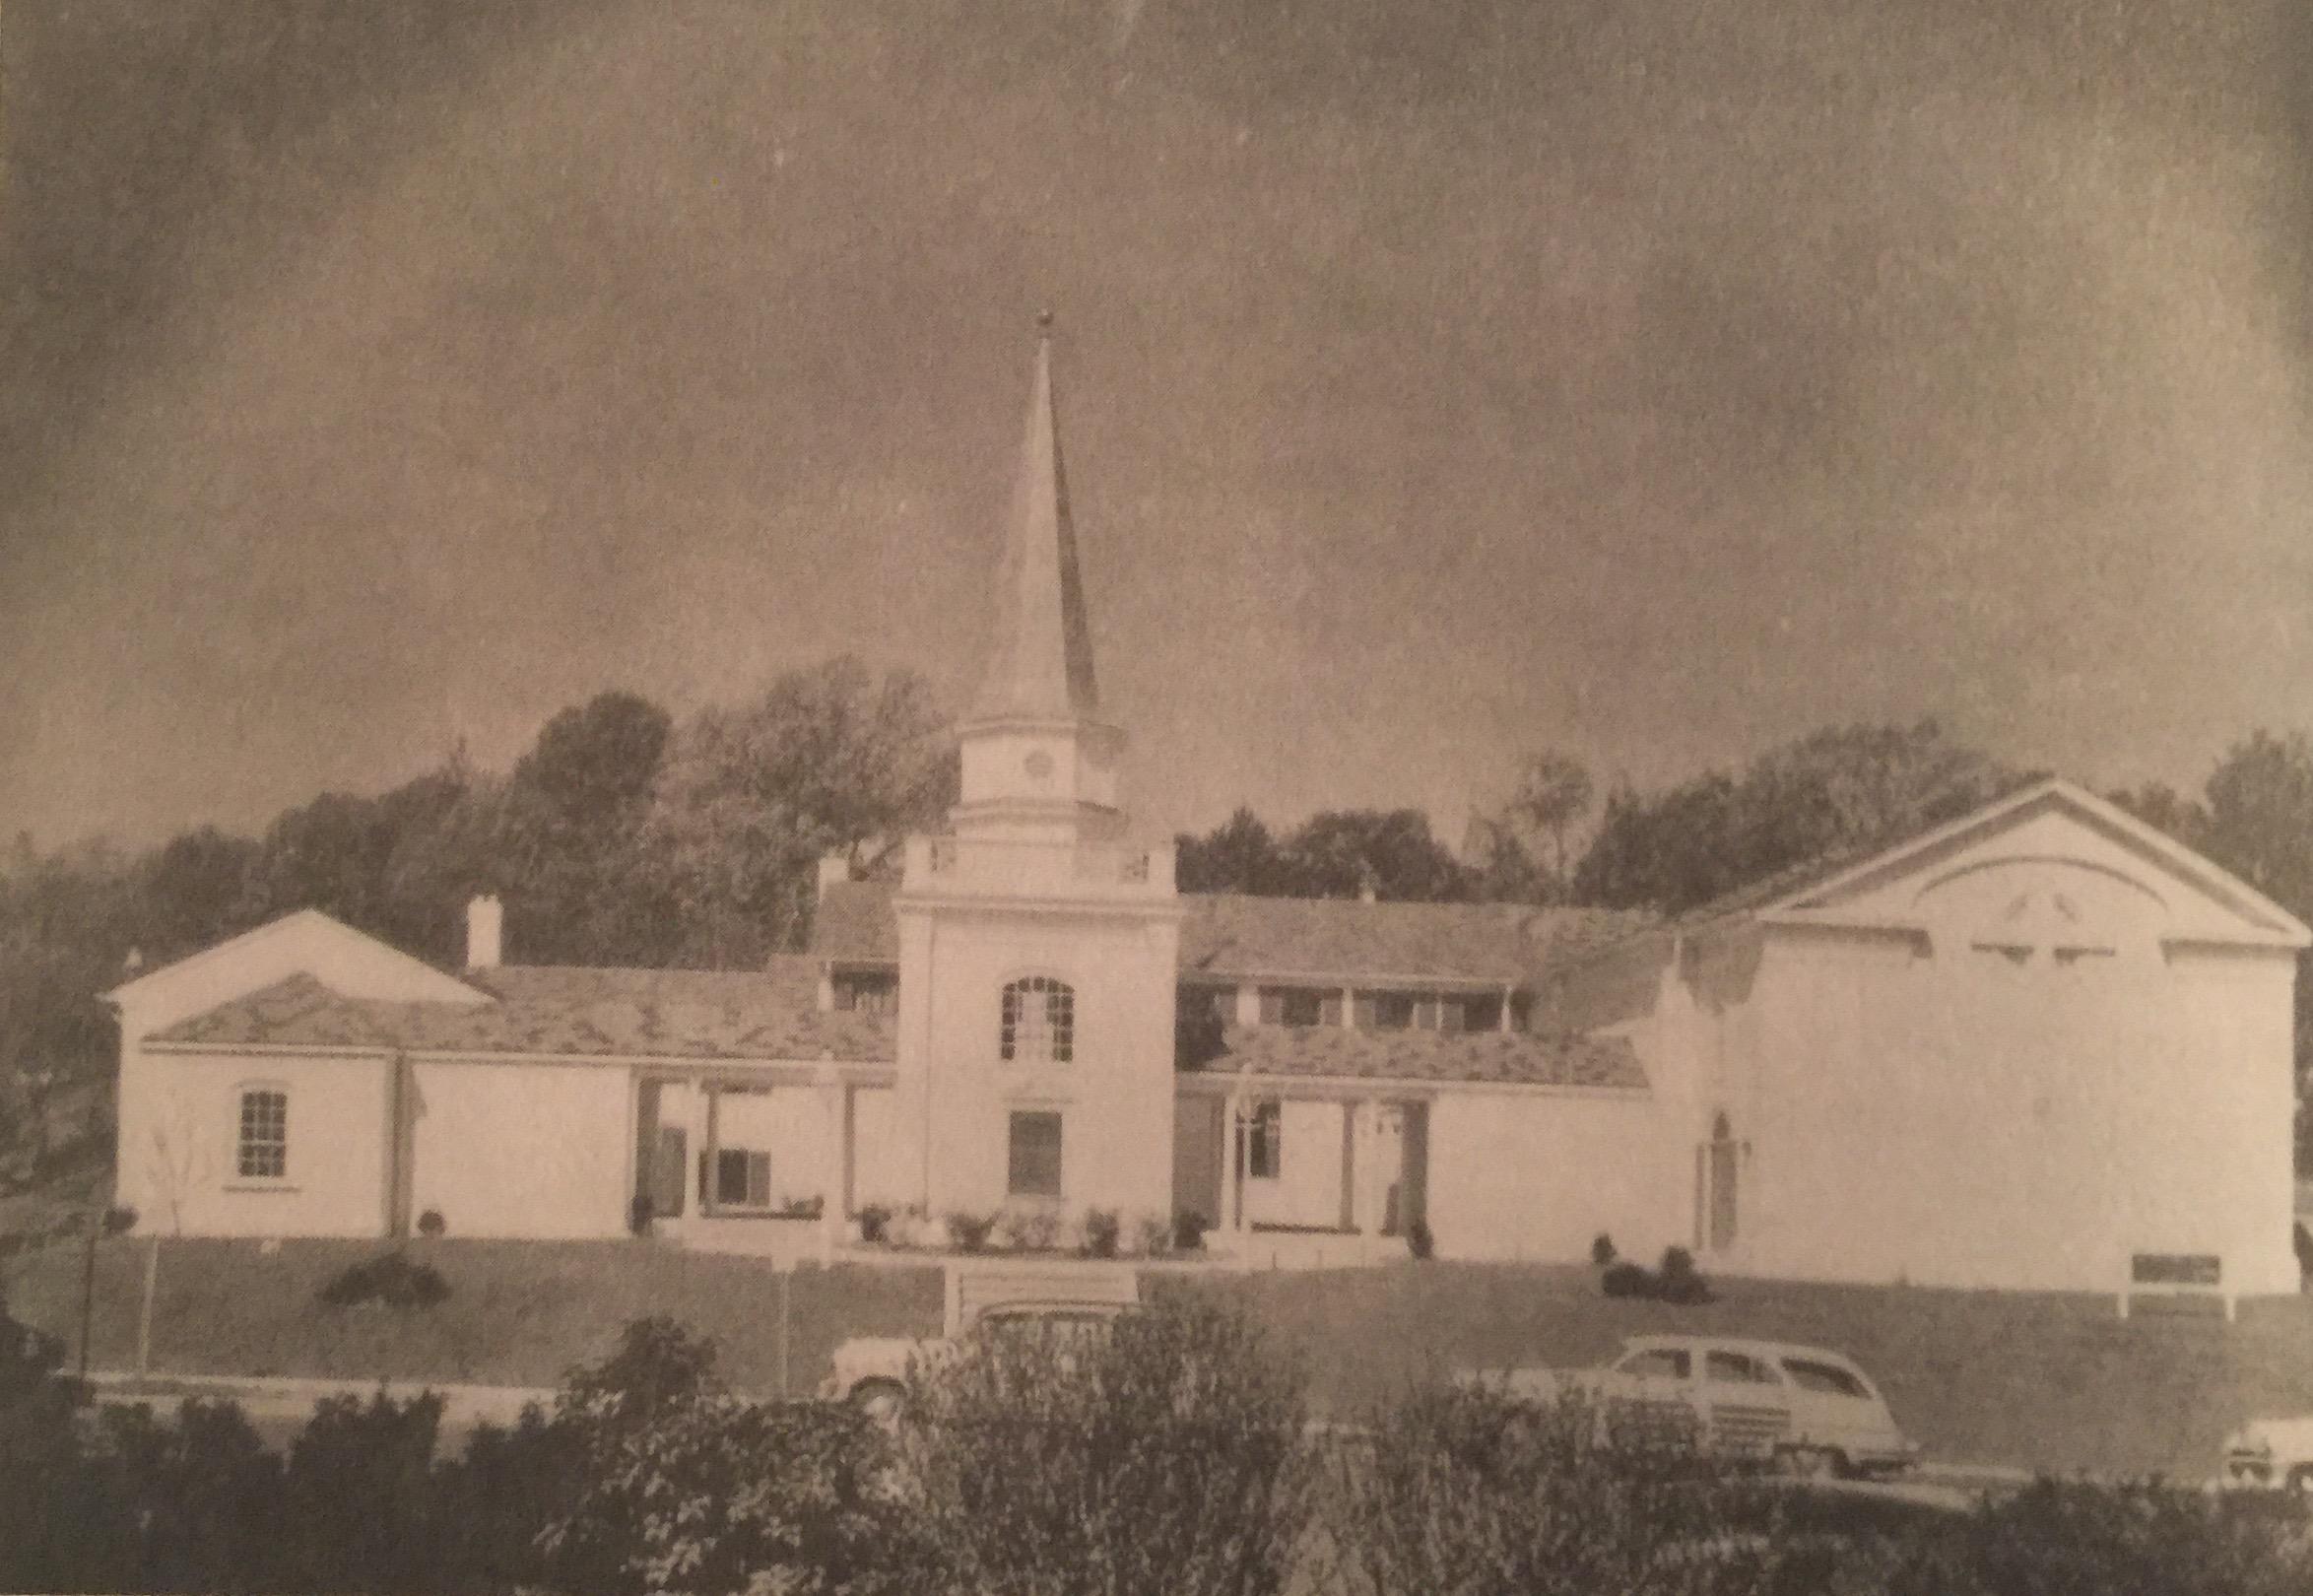 Beverley Hills Community United Methodist Church